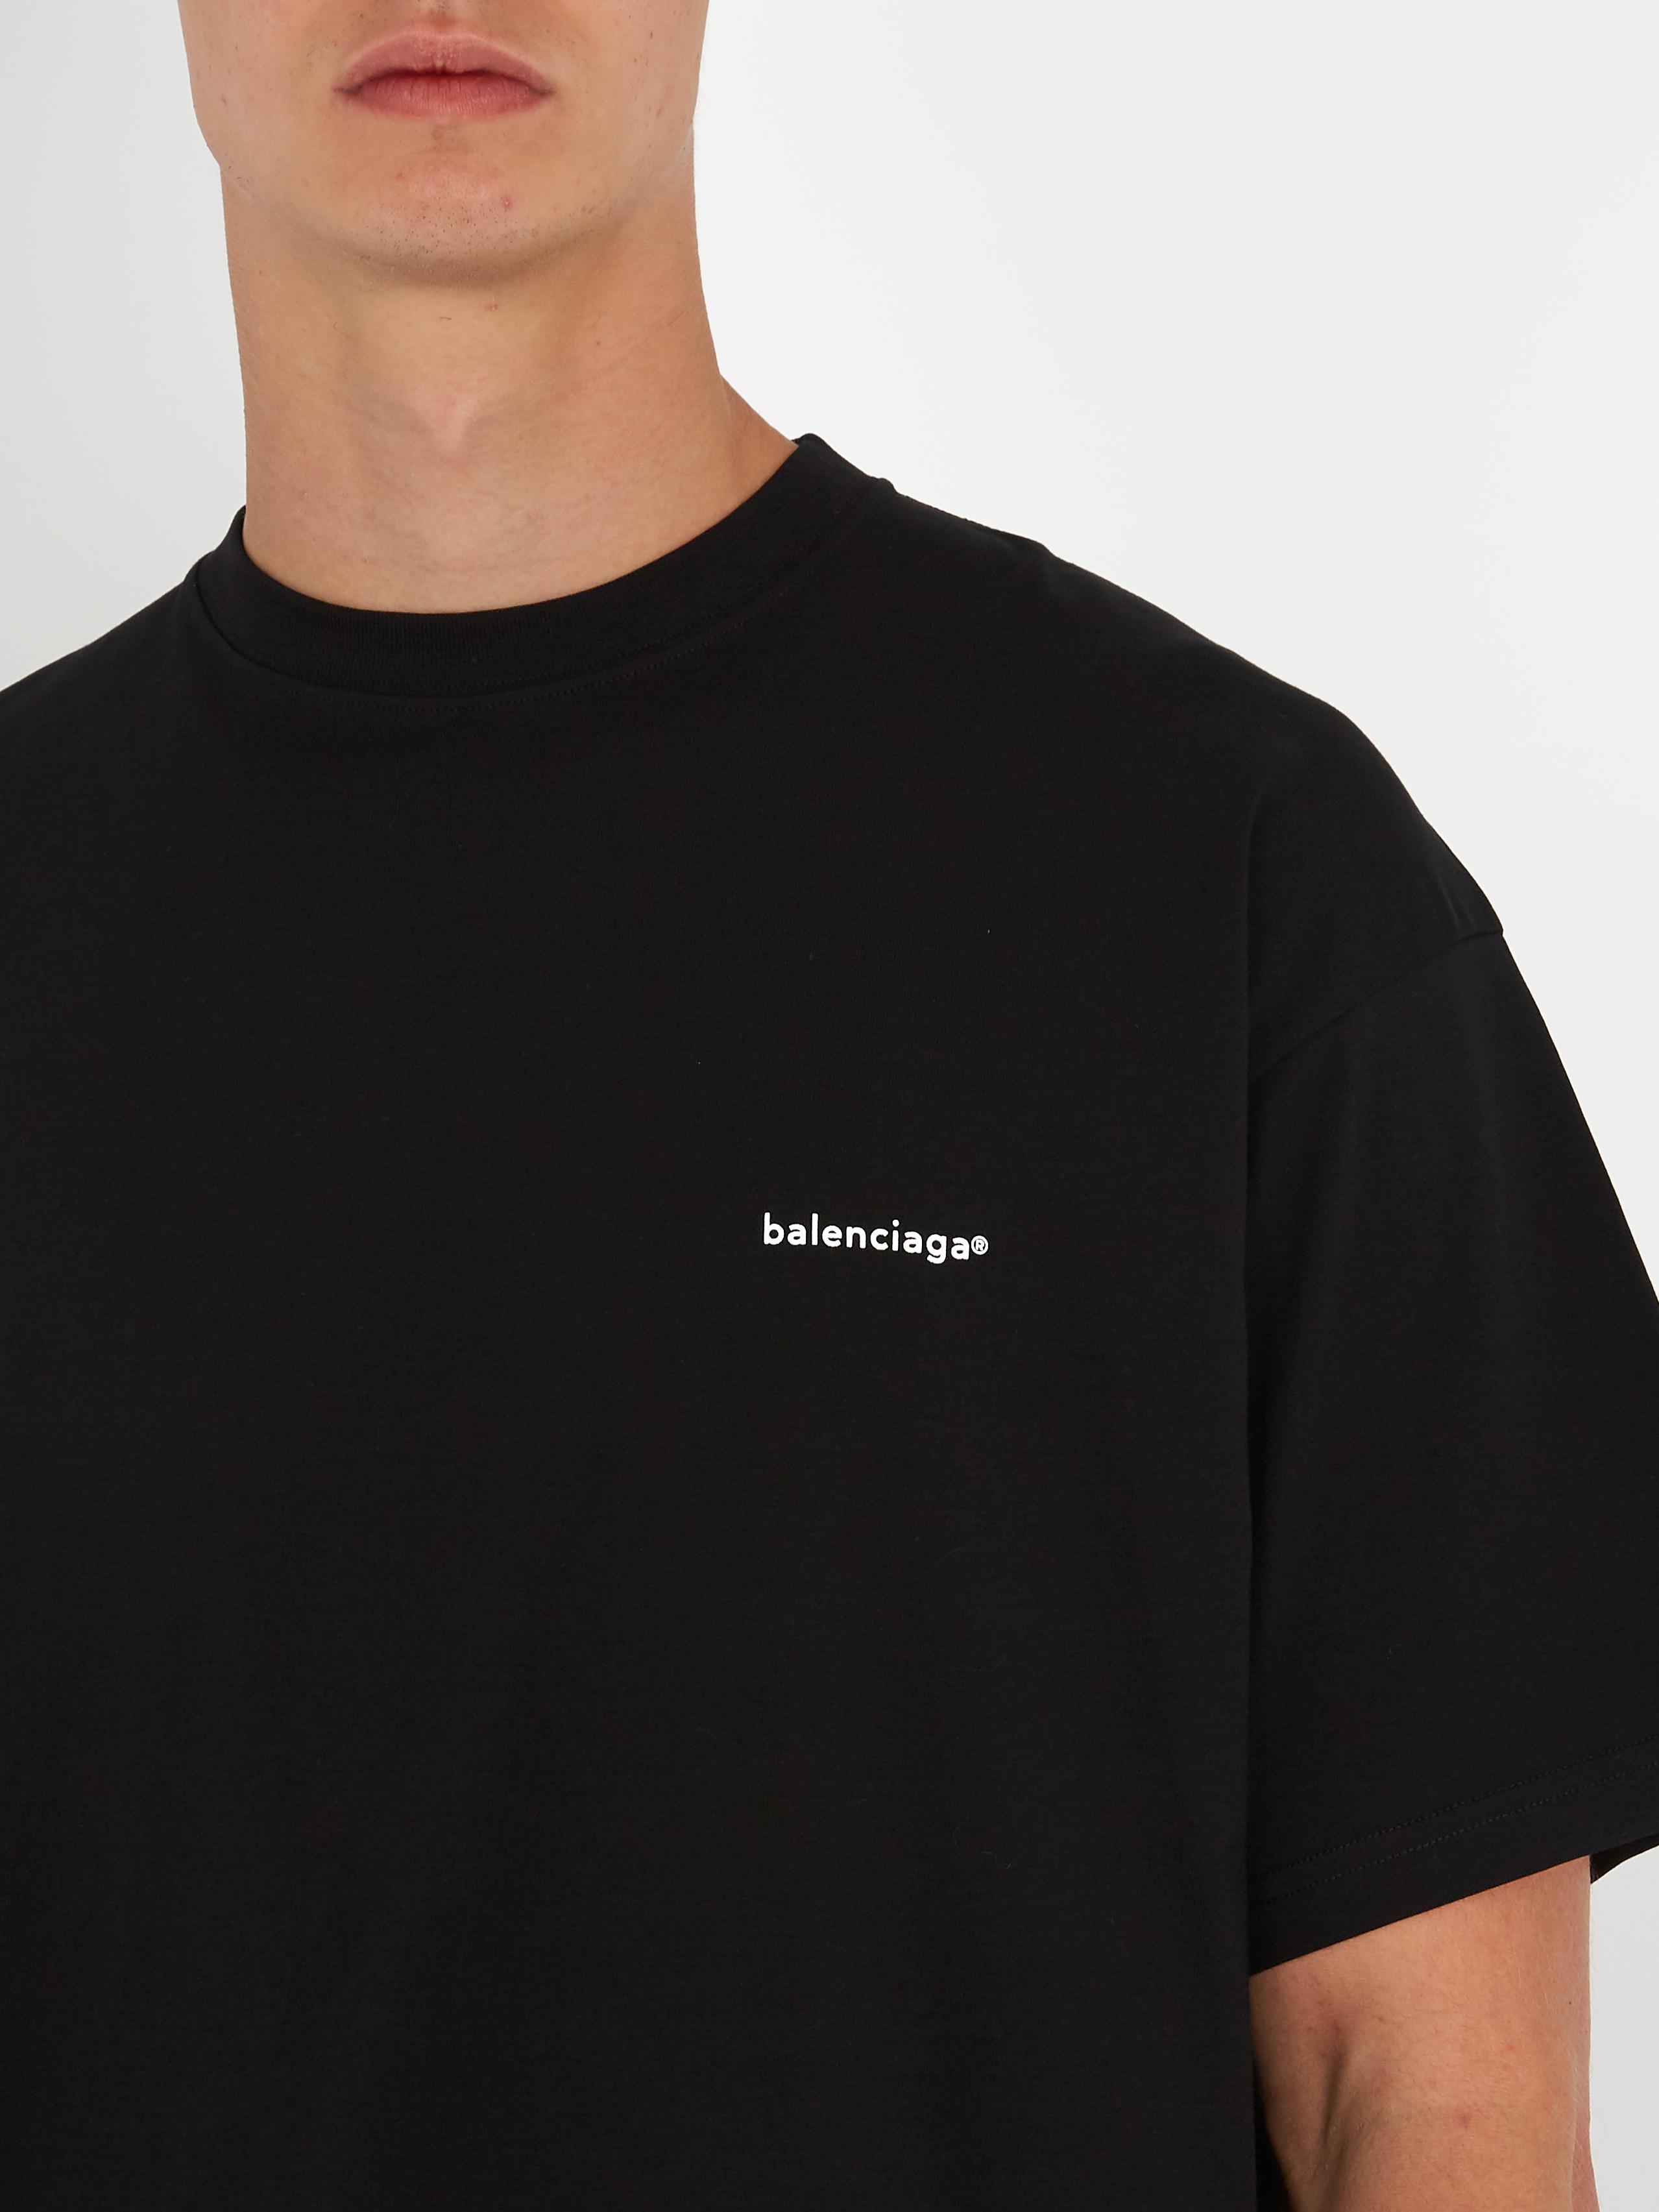 a572d5a4b2b8 Balenciaga Oversized Logo-print Cotton T-shirt in Black for Men - Lyst